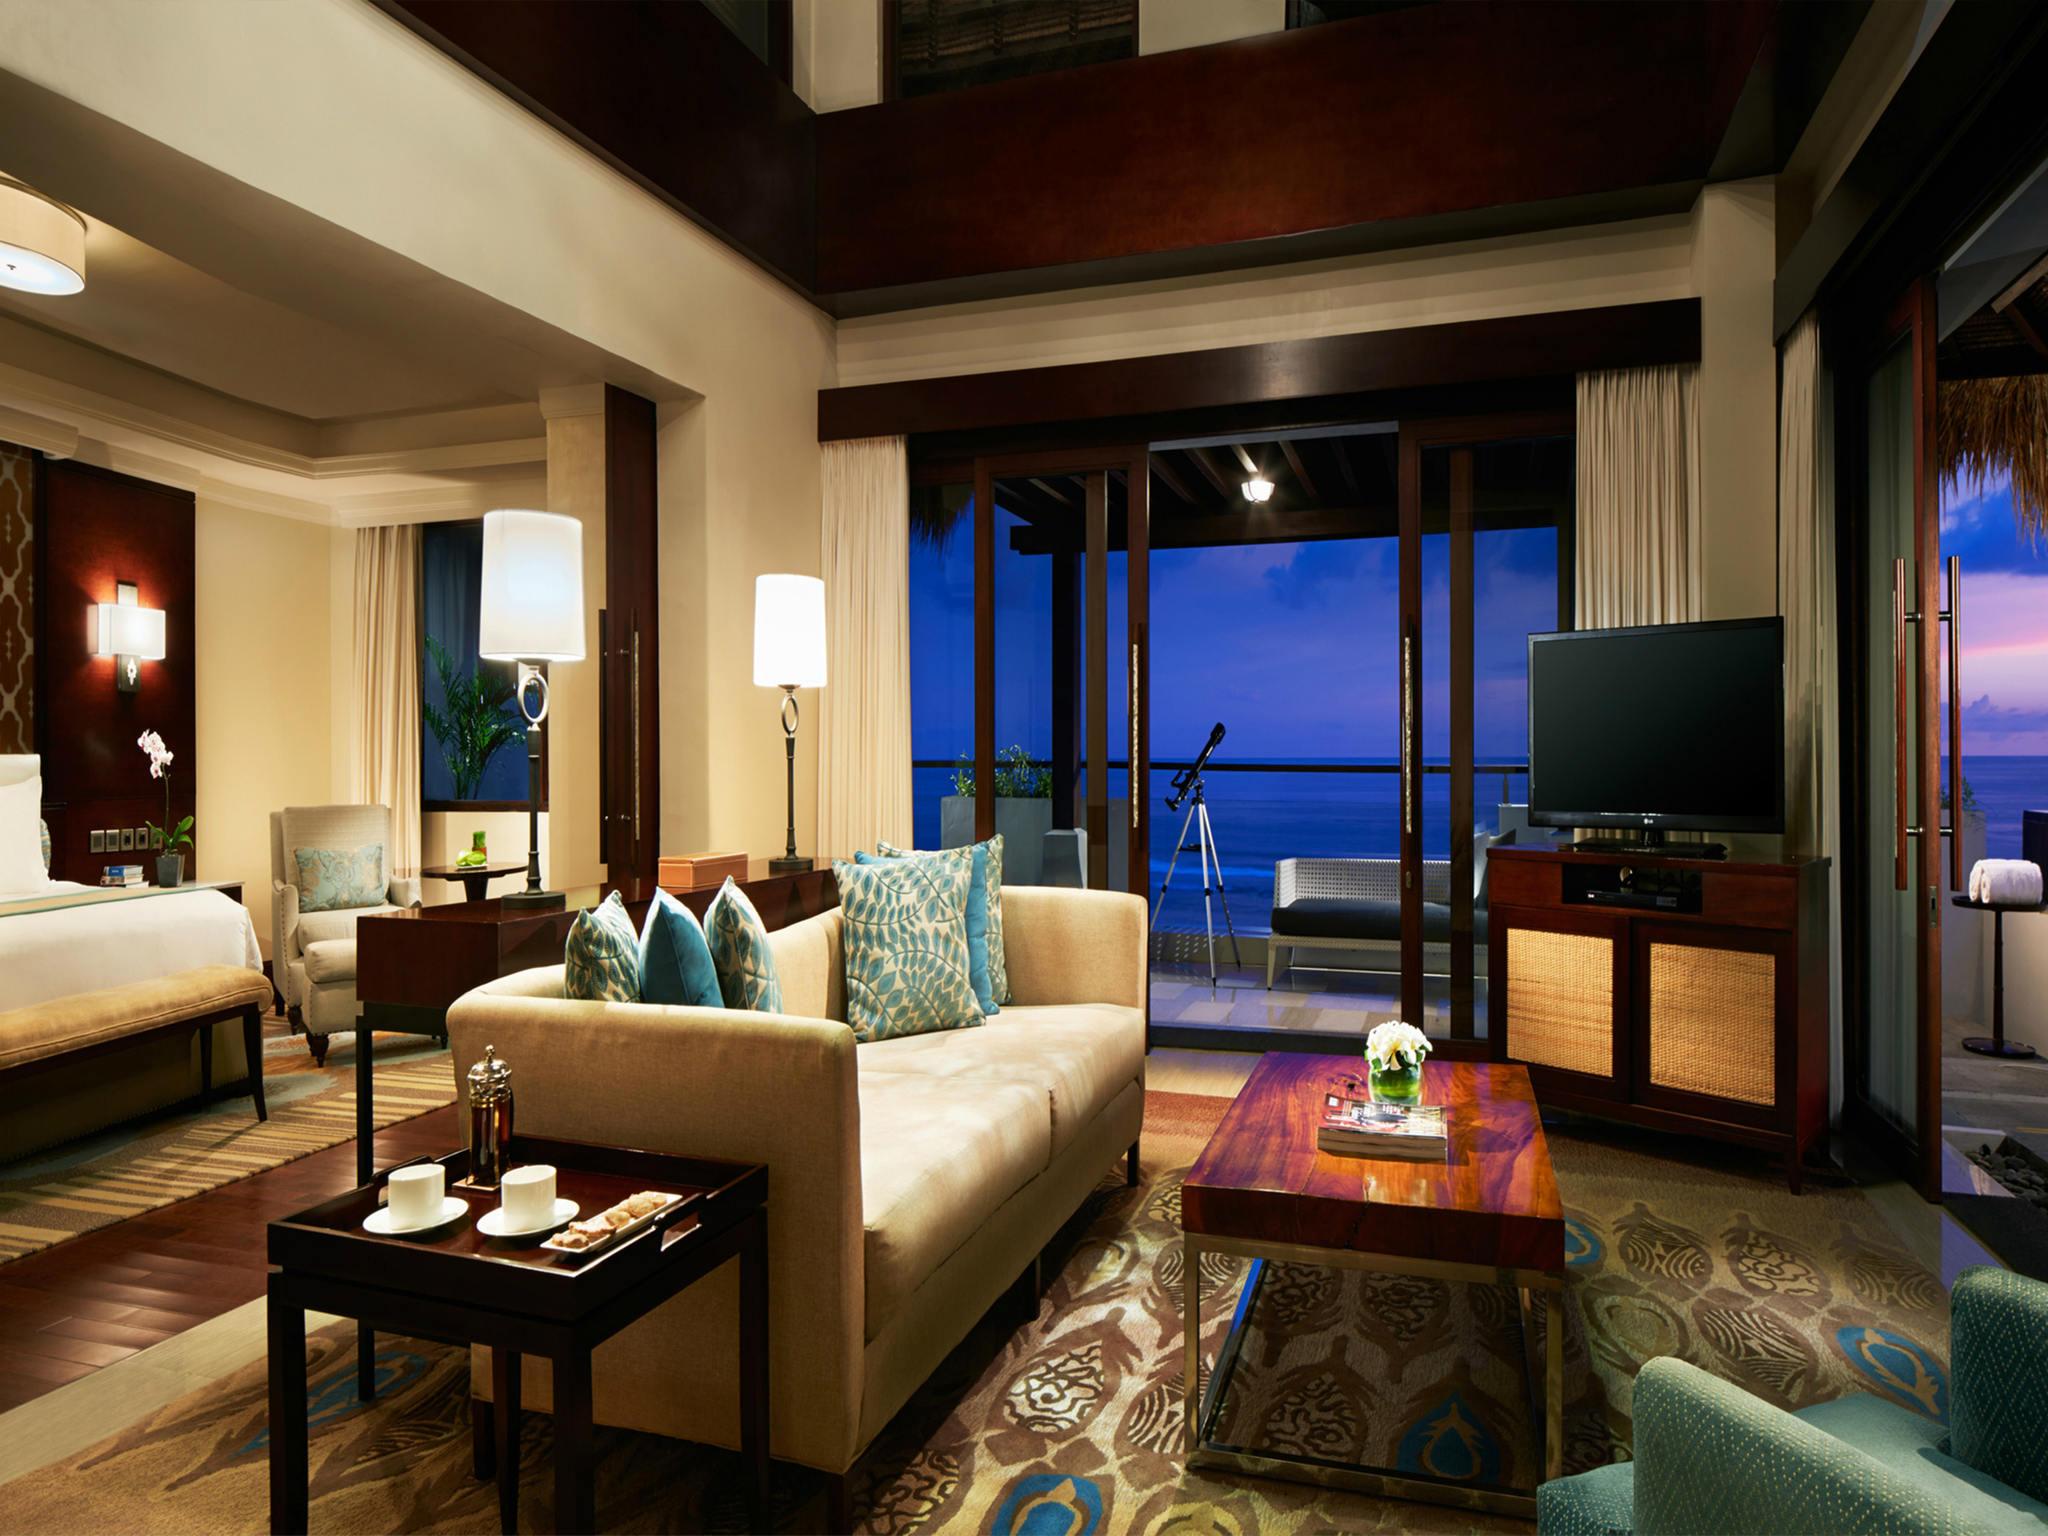 Novotel Nusa Dua 2 Bedroom Suite Hotel In Nusa Dua Samabe Bali Suites And Villas